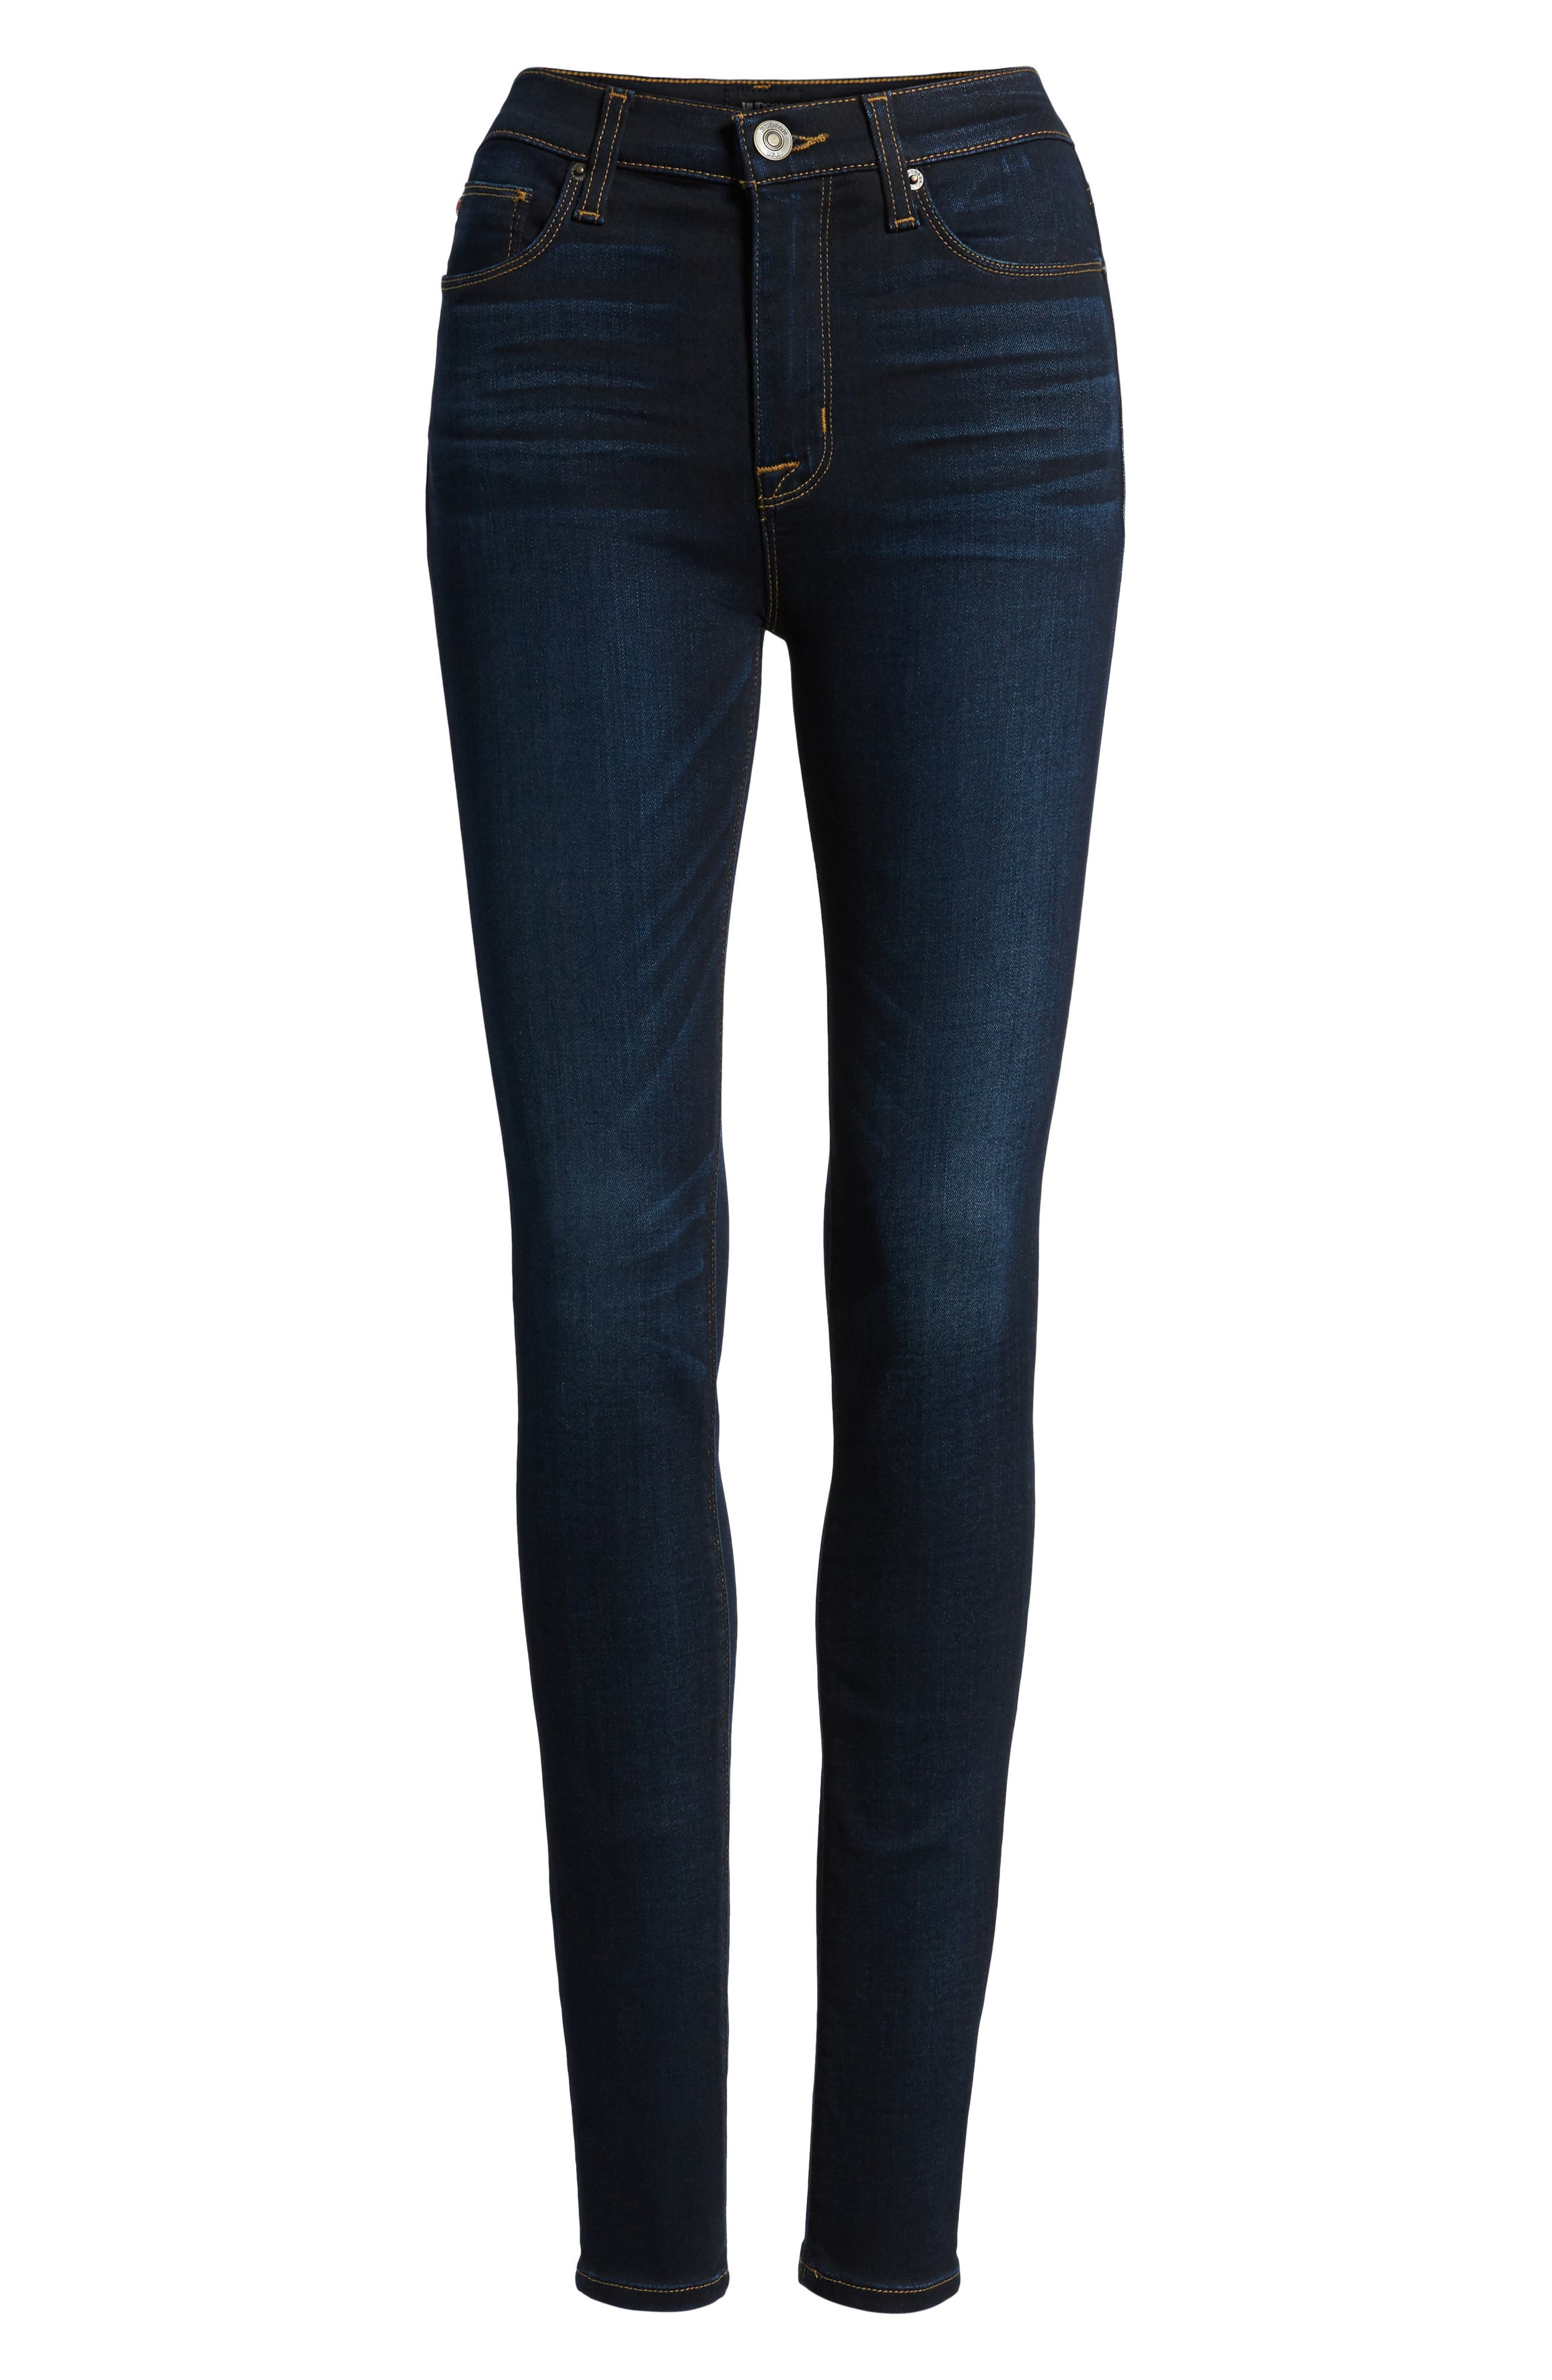 Barbara High Waist Ankle Supermodel Skinny Jeans,                             Alternate thumbnail 7, color,                             Calvary